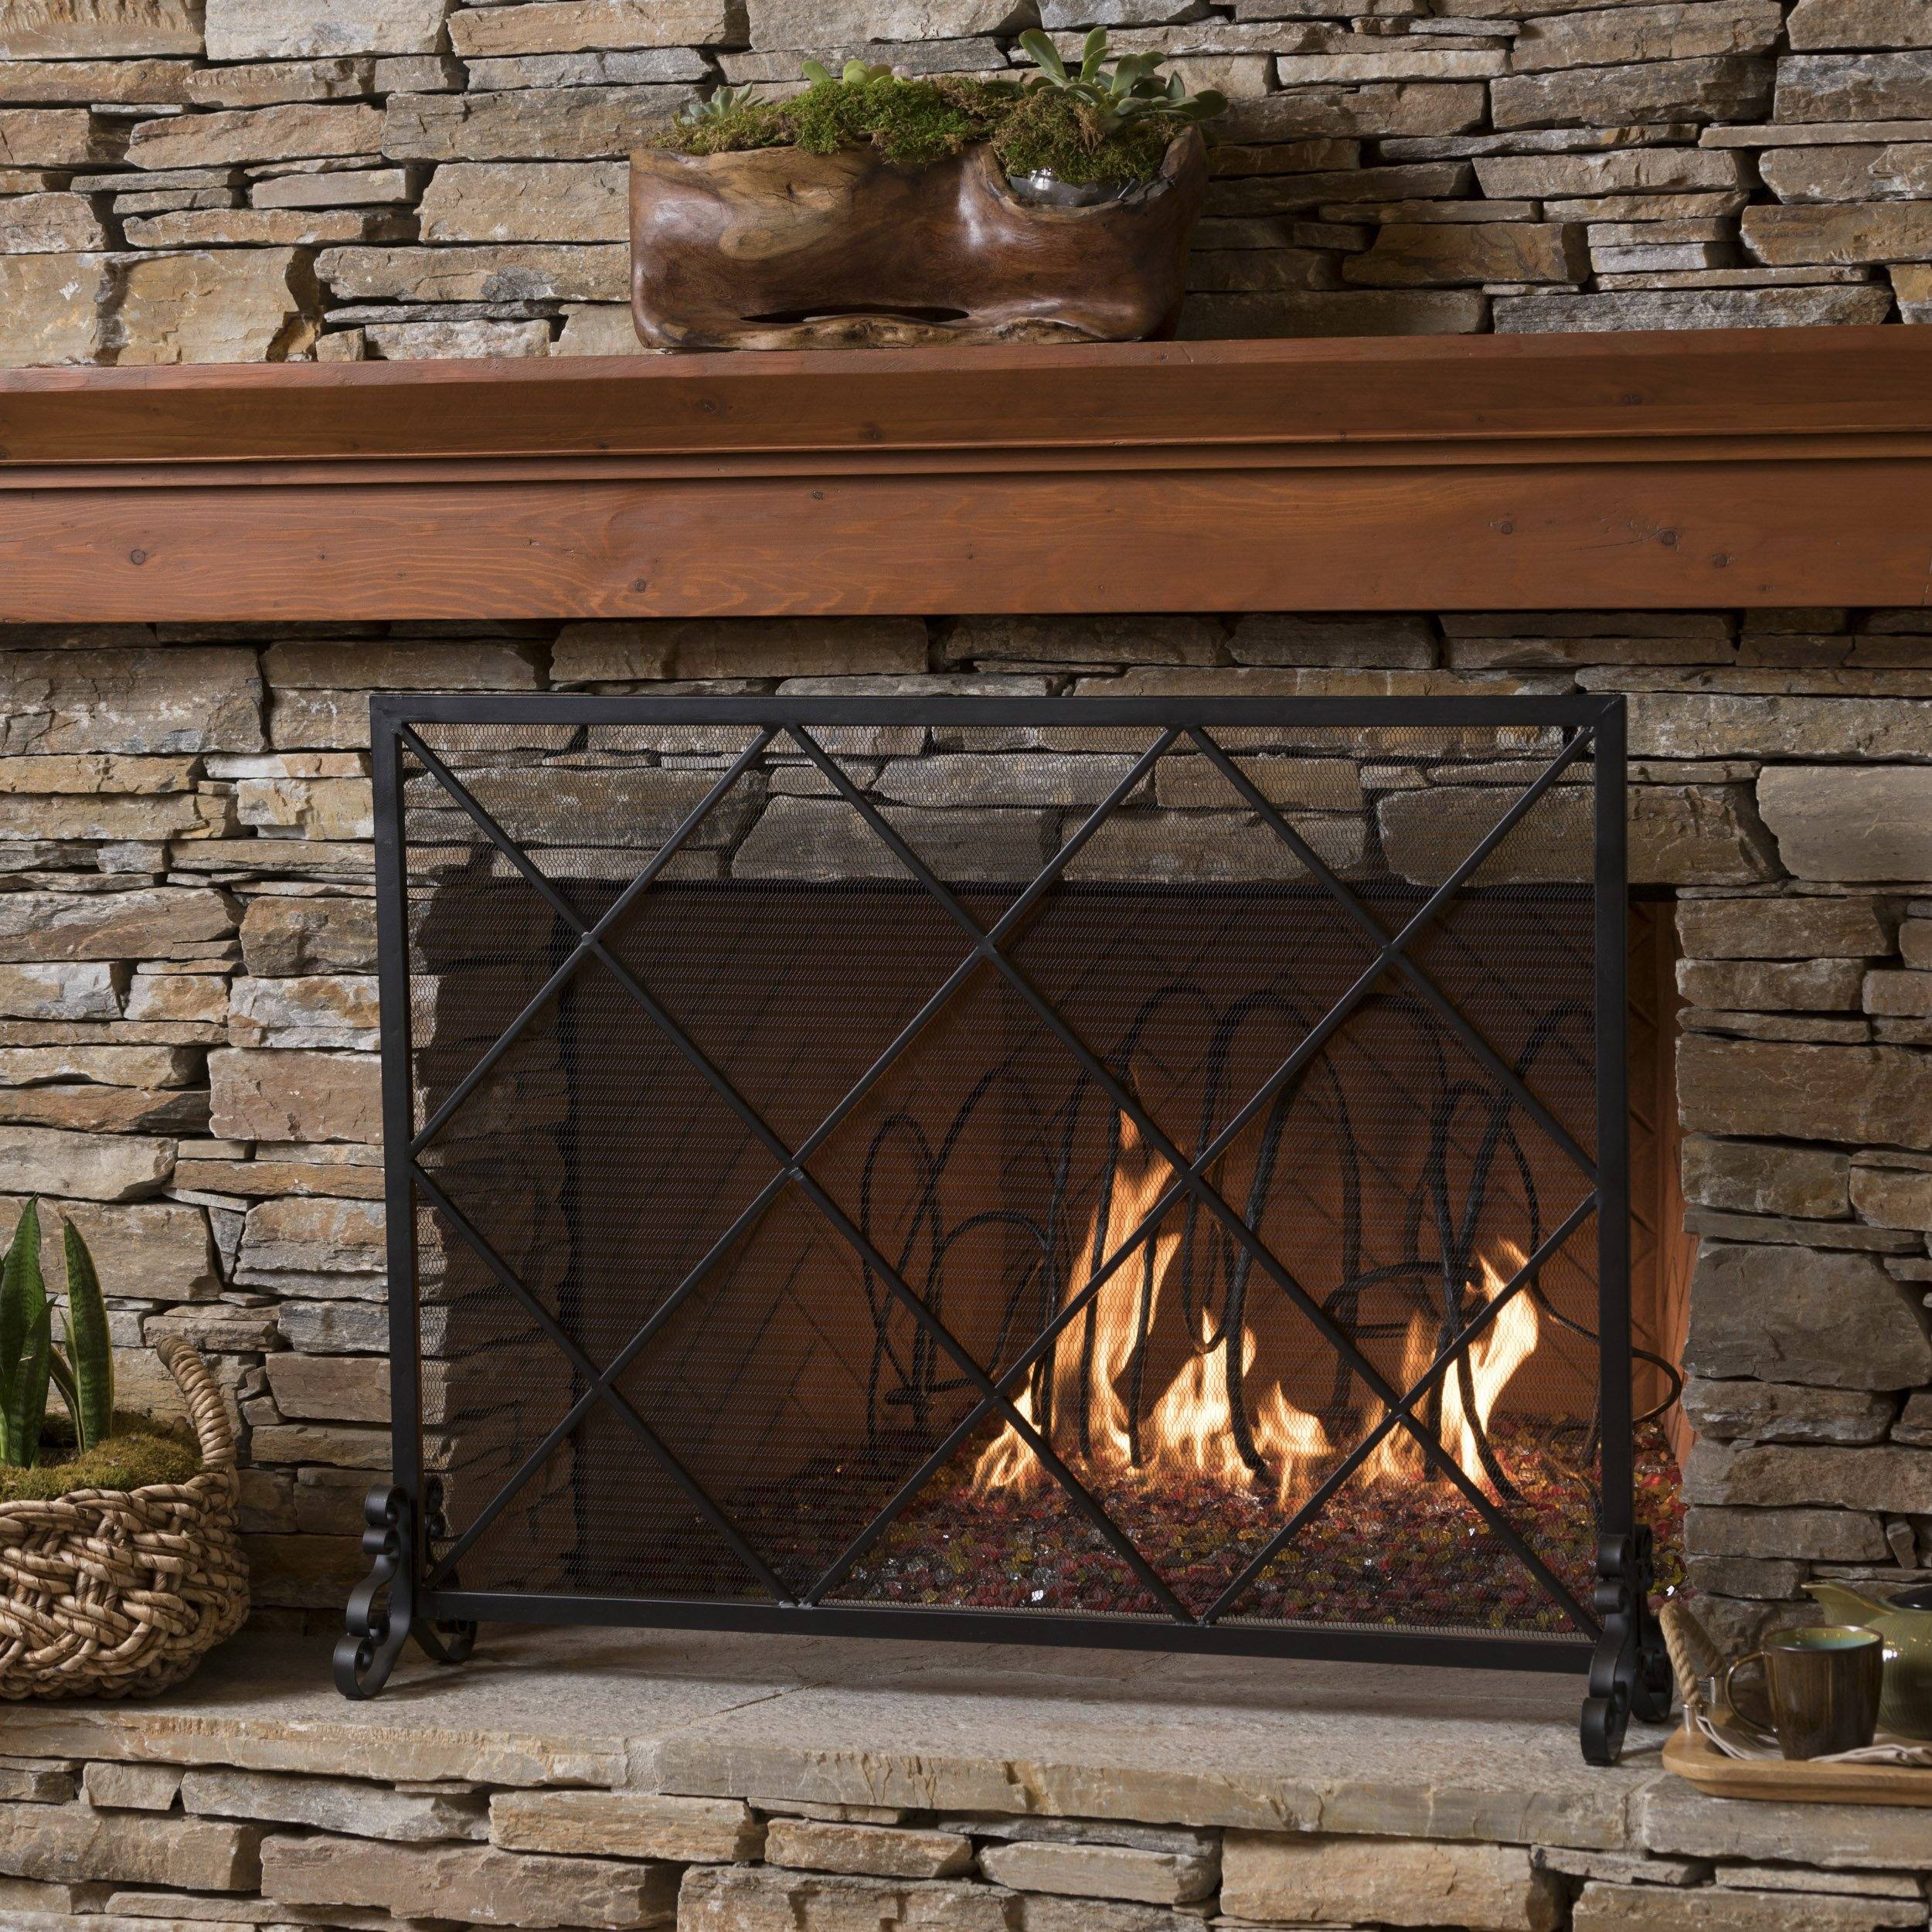 Great Deal Furniture 302042 Hayden Single Panel Black Iron Fire Screen by Great Deal Furniture